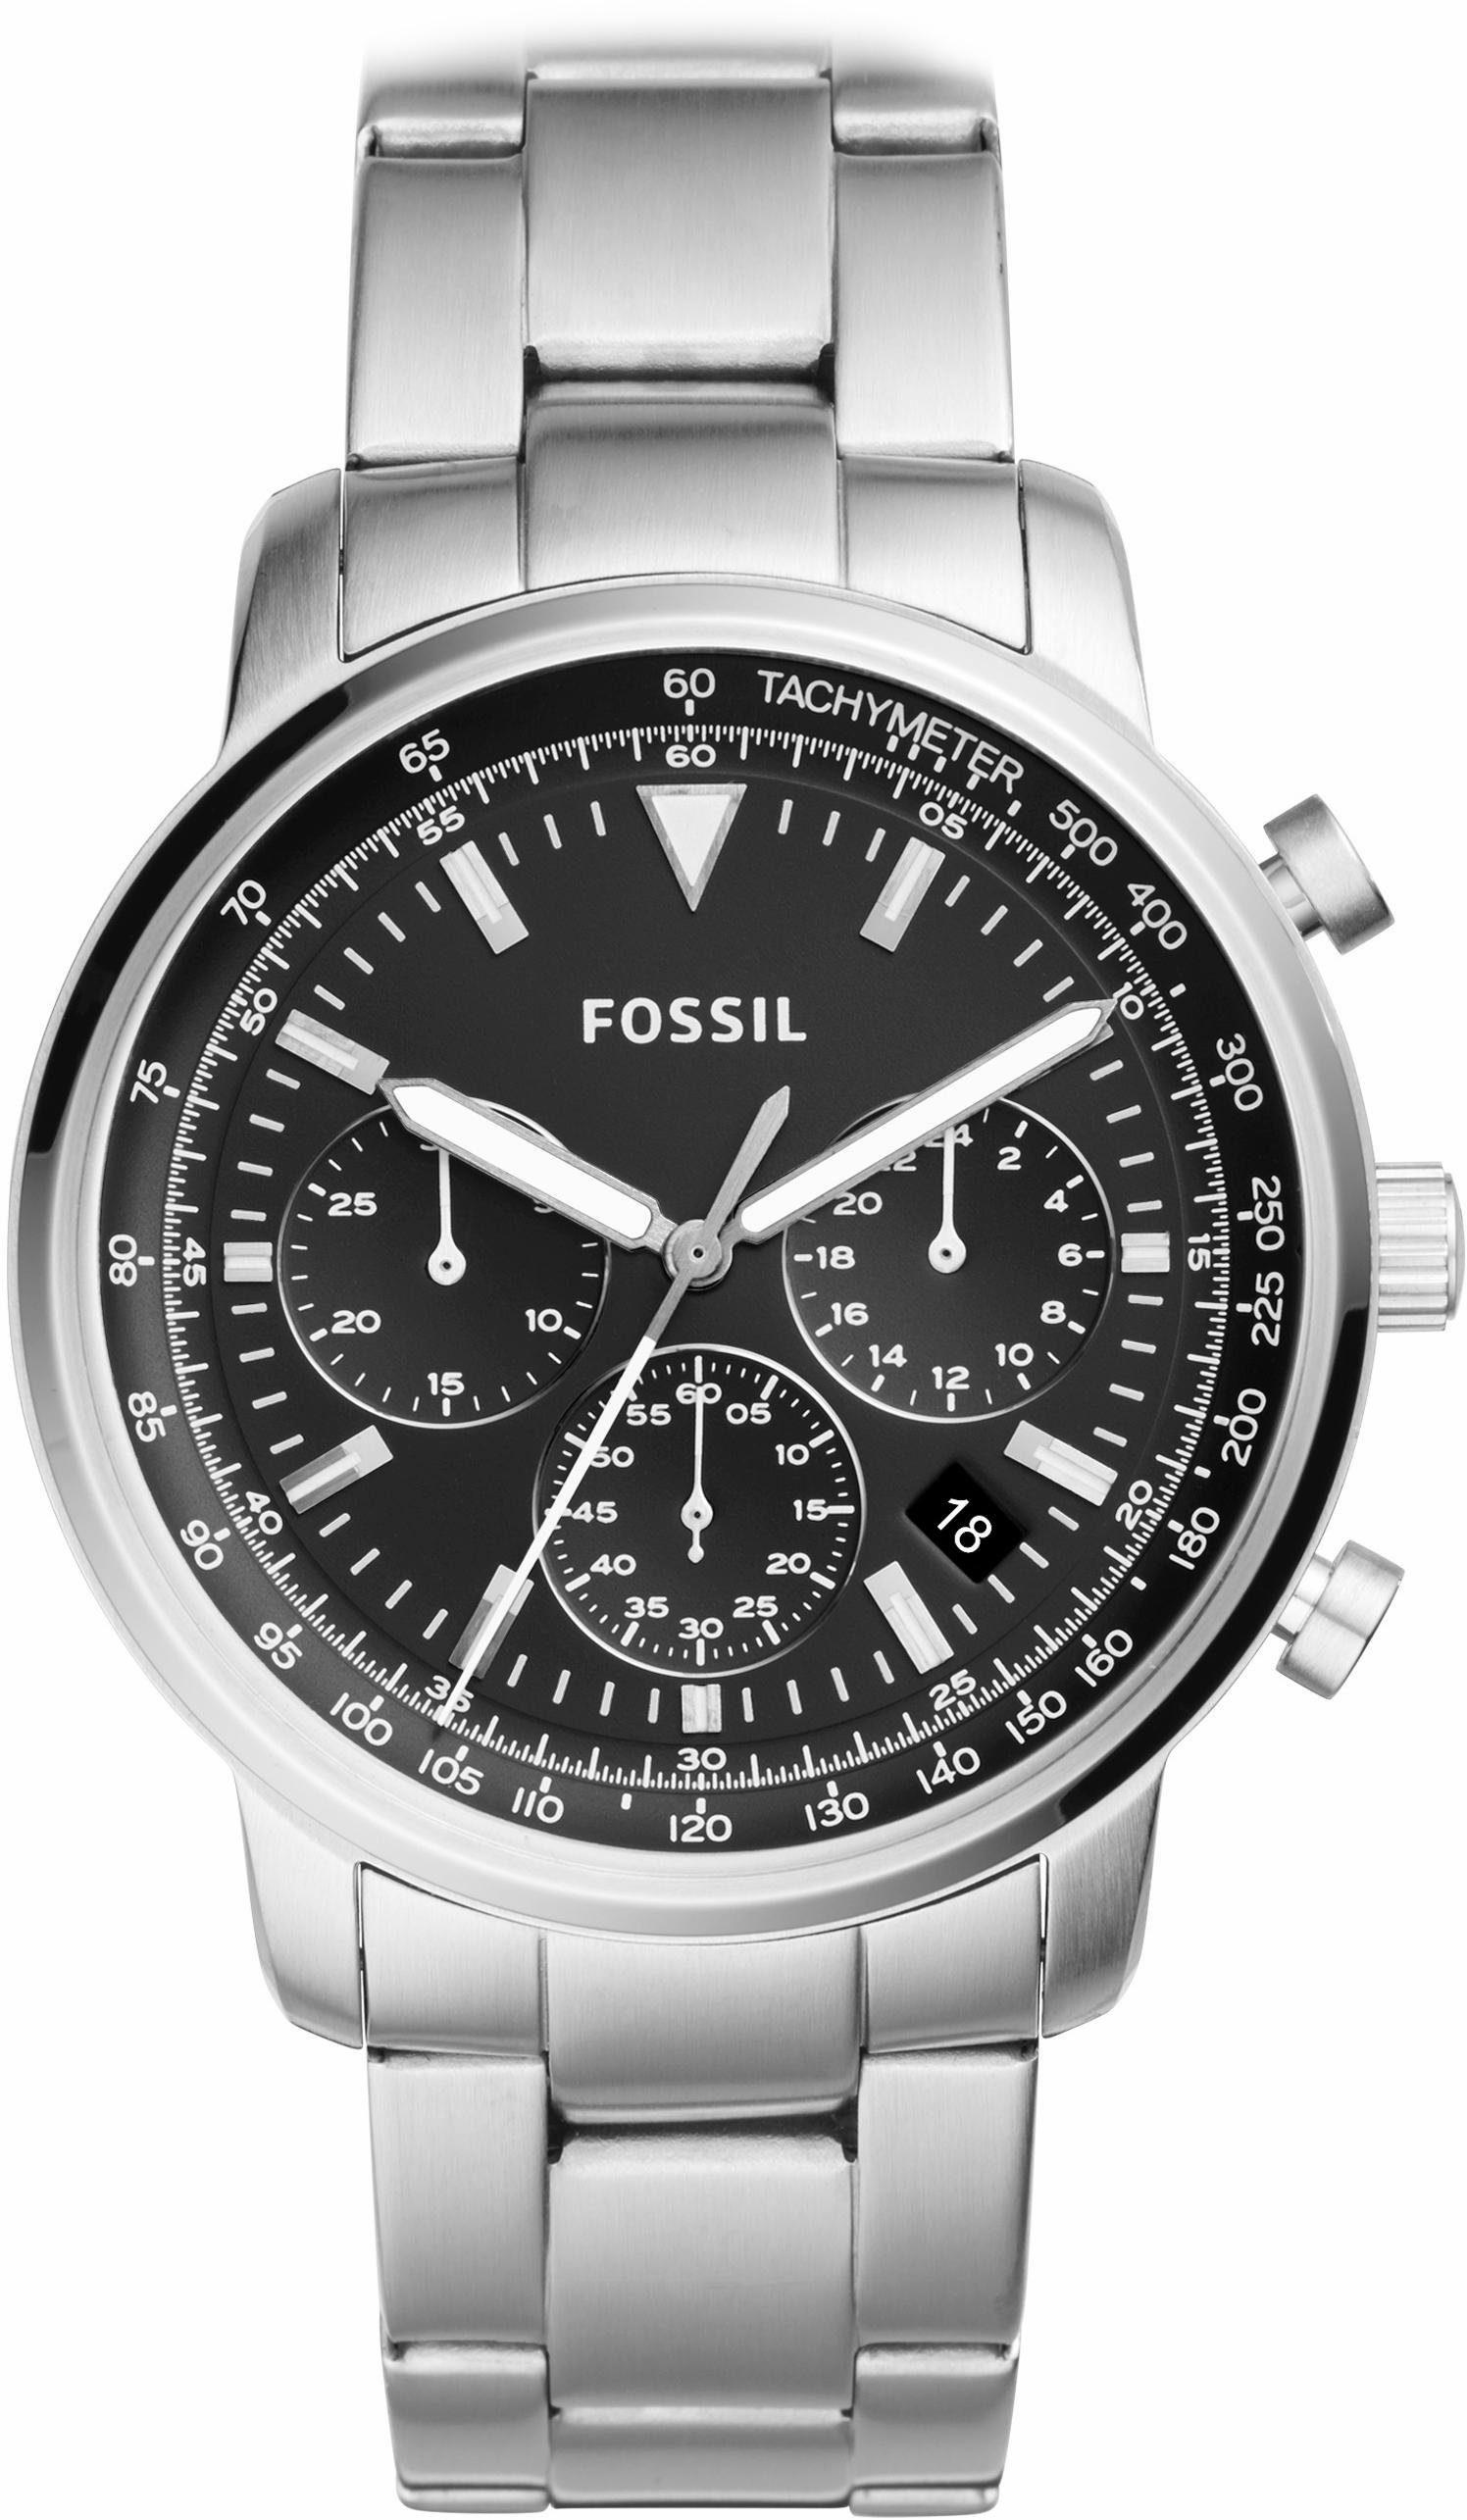 Fossil Chronograph »GOODWIN CHRONO, FS5412«